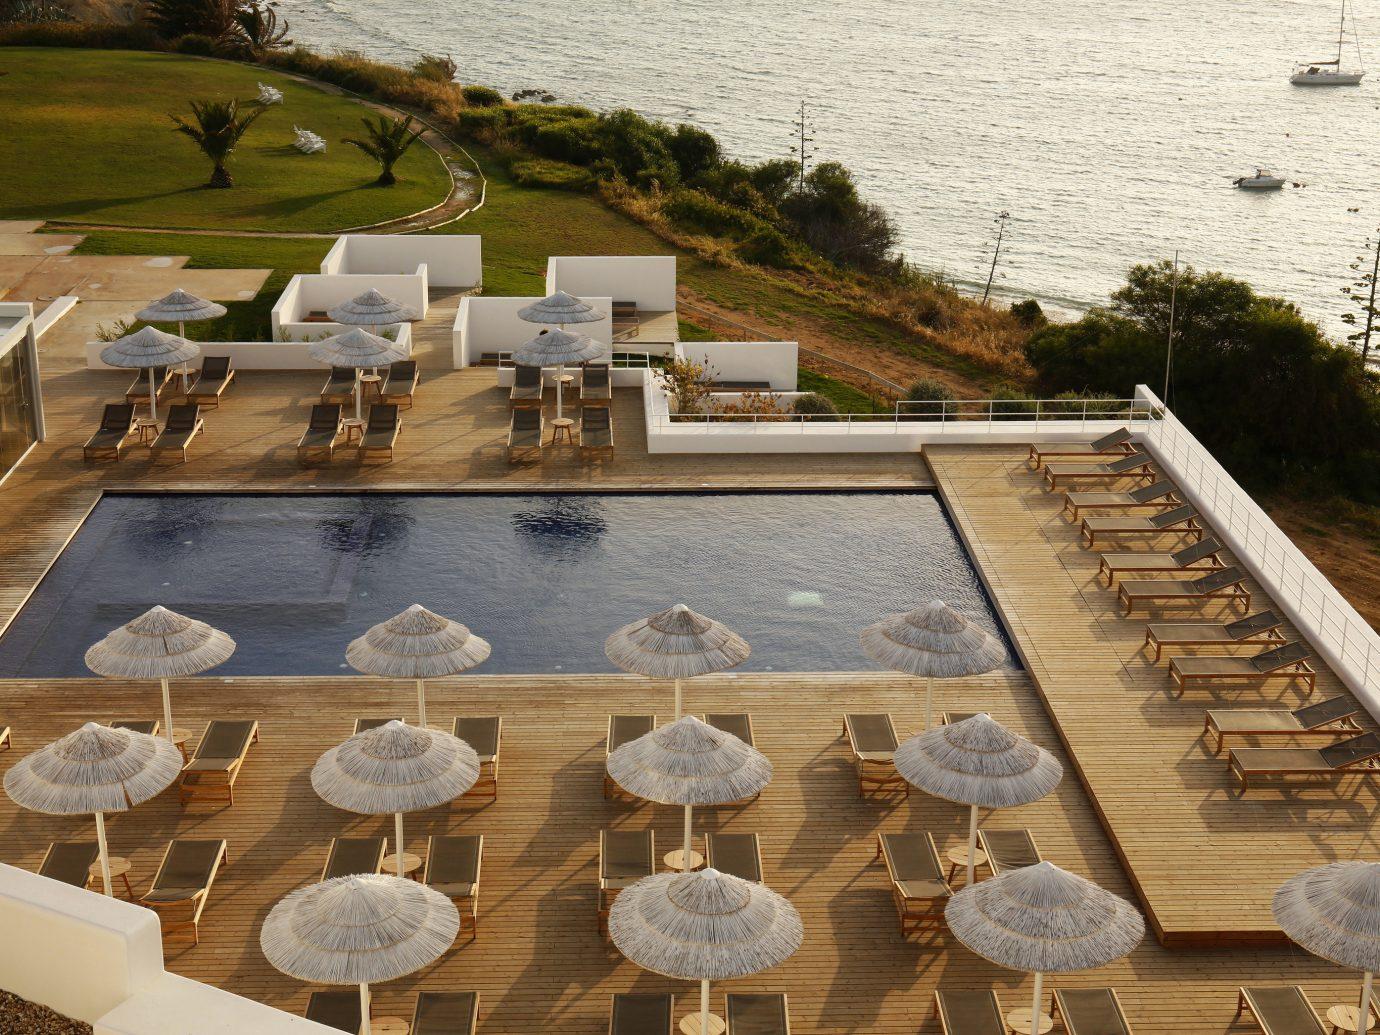 Boutique Hotels Health + Wellness Hotels Luxury Travel Romance Secret Getaways Spa Retreats Trip Ideas table outdoor grass water roof outdoor structure